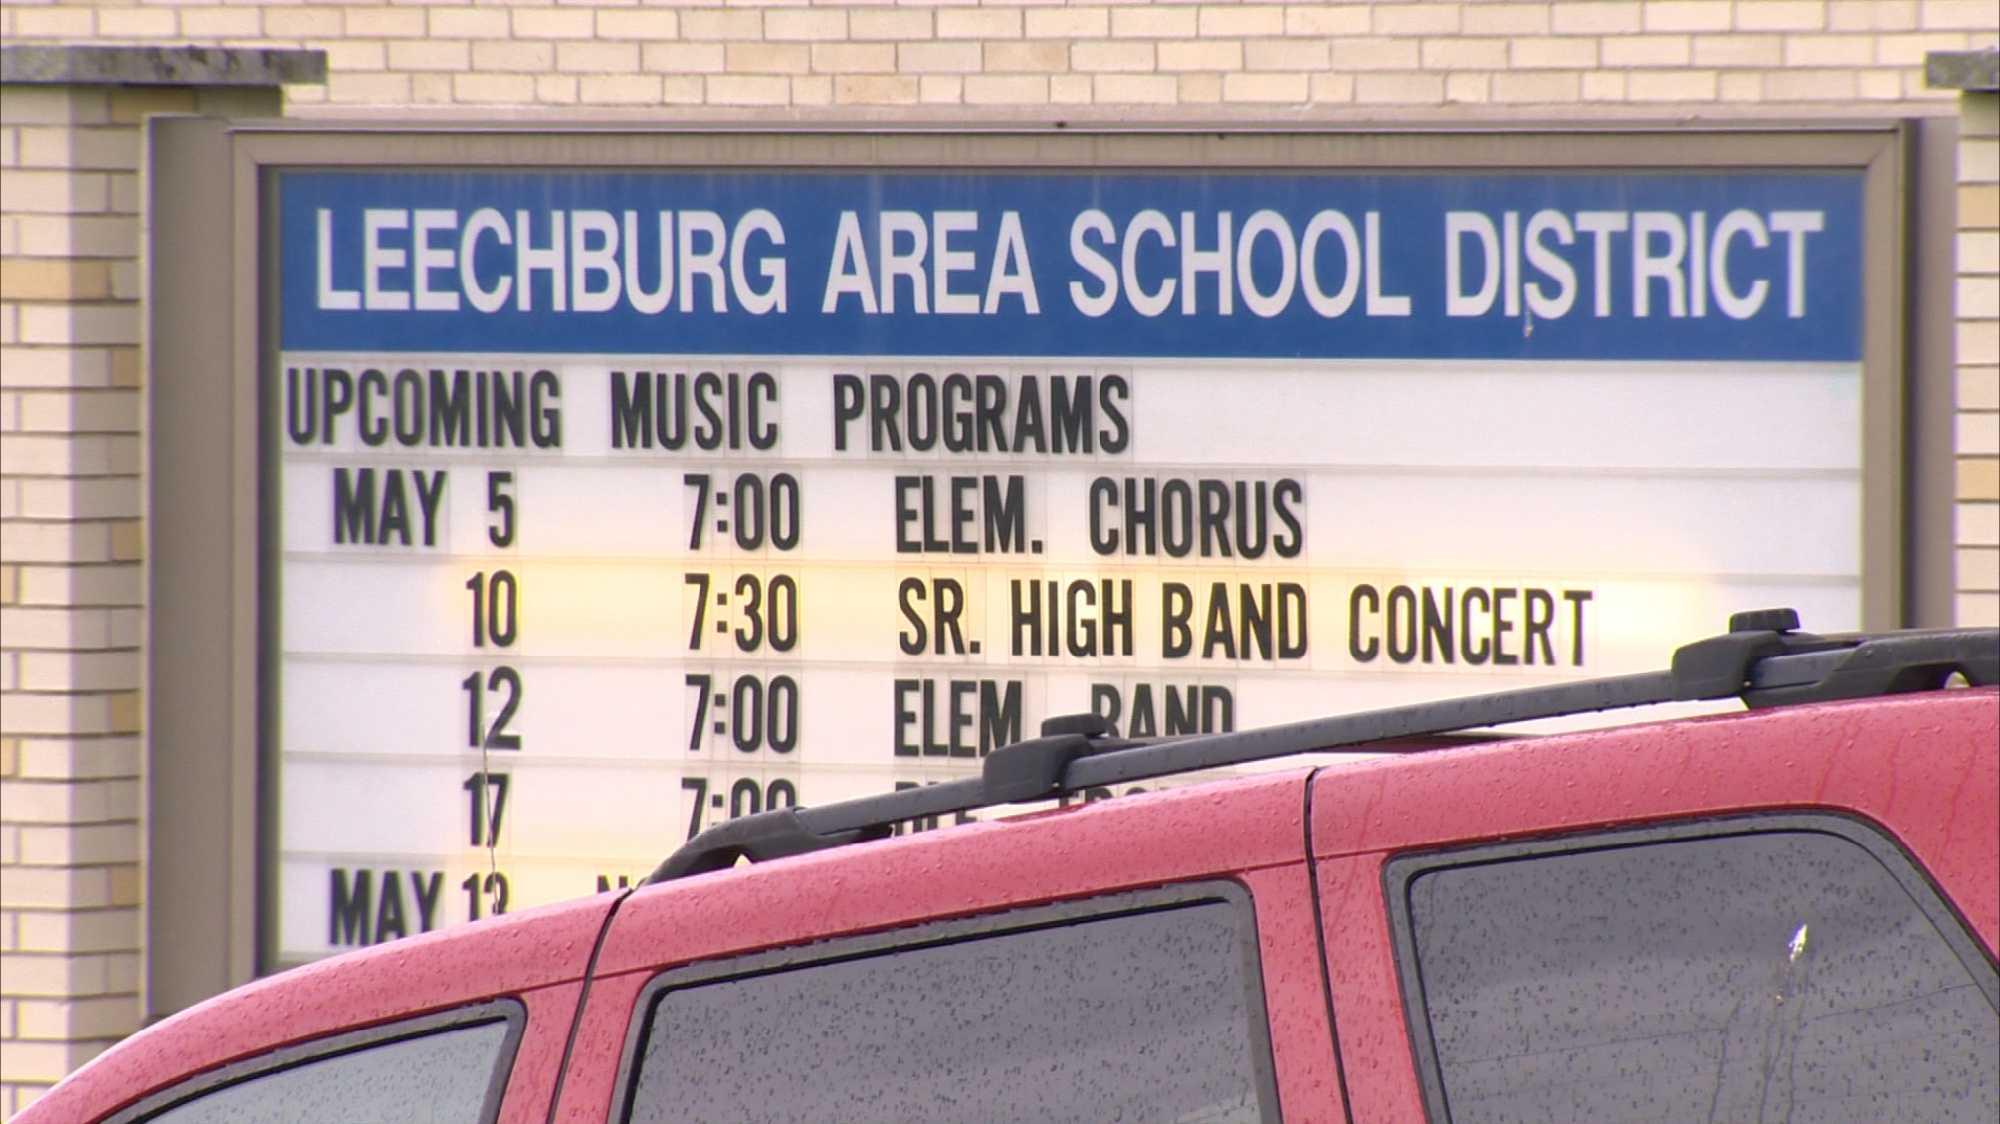 Leechburg Area School District